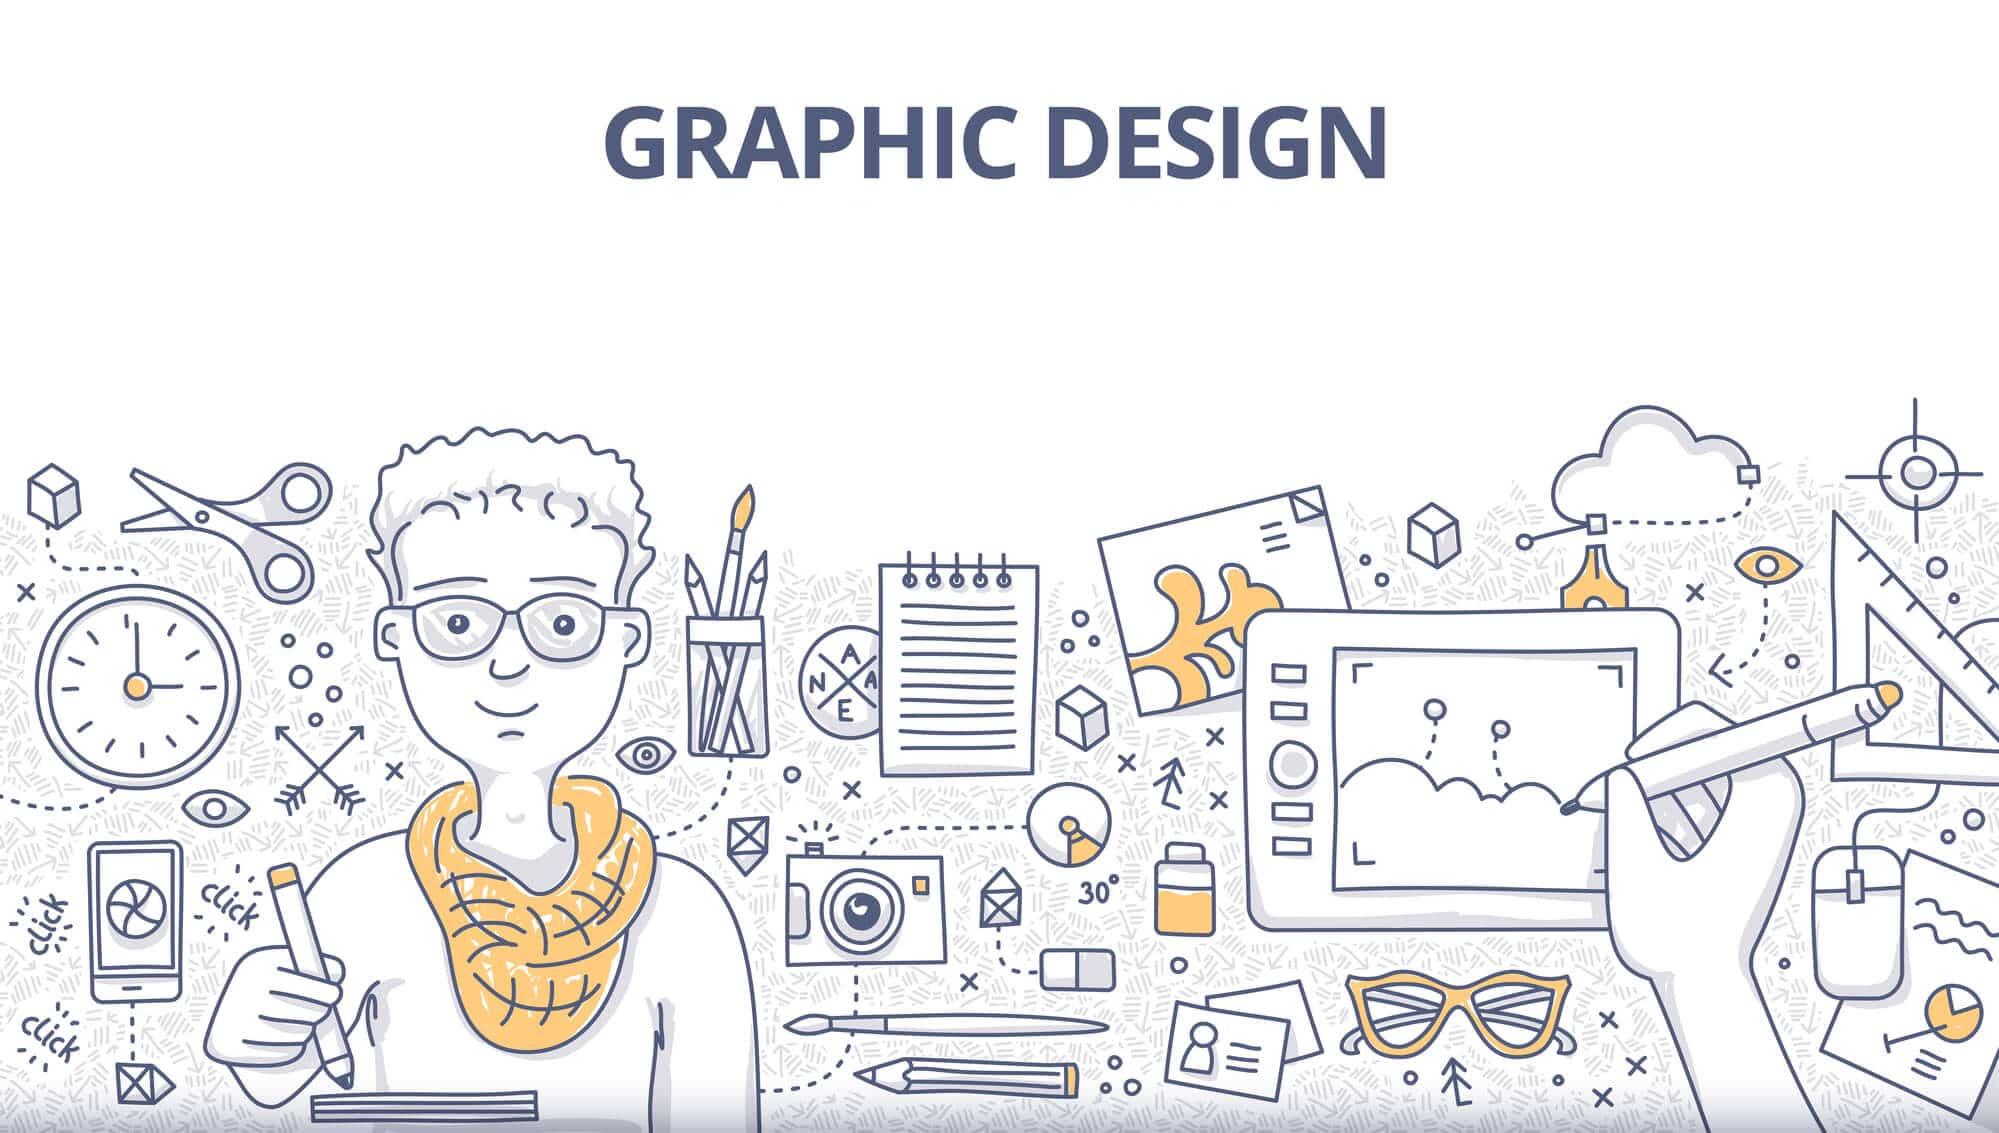 new orleans graphics design - Big Easy SEO